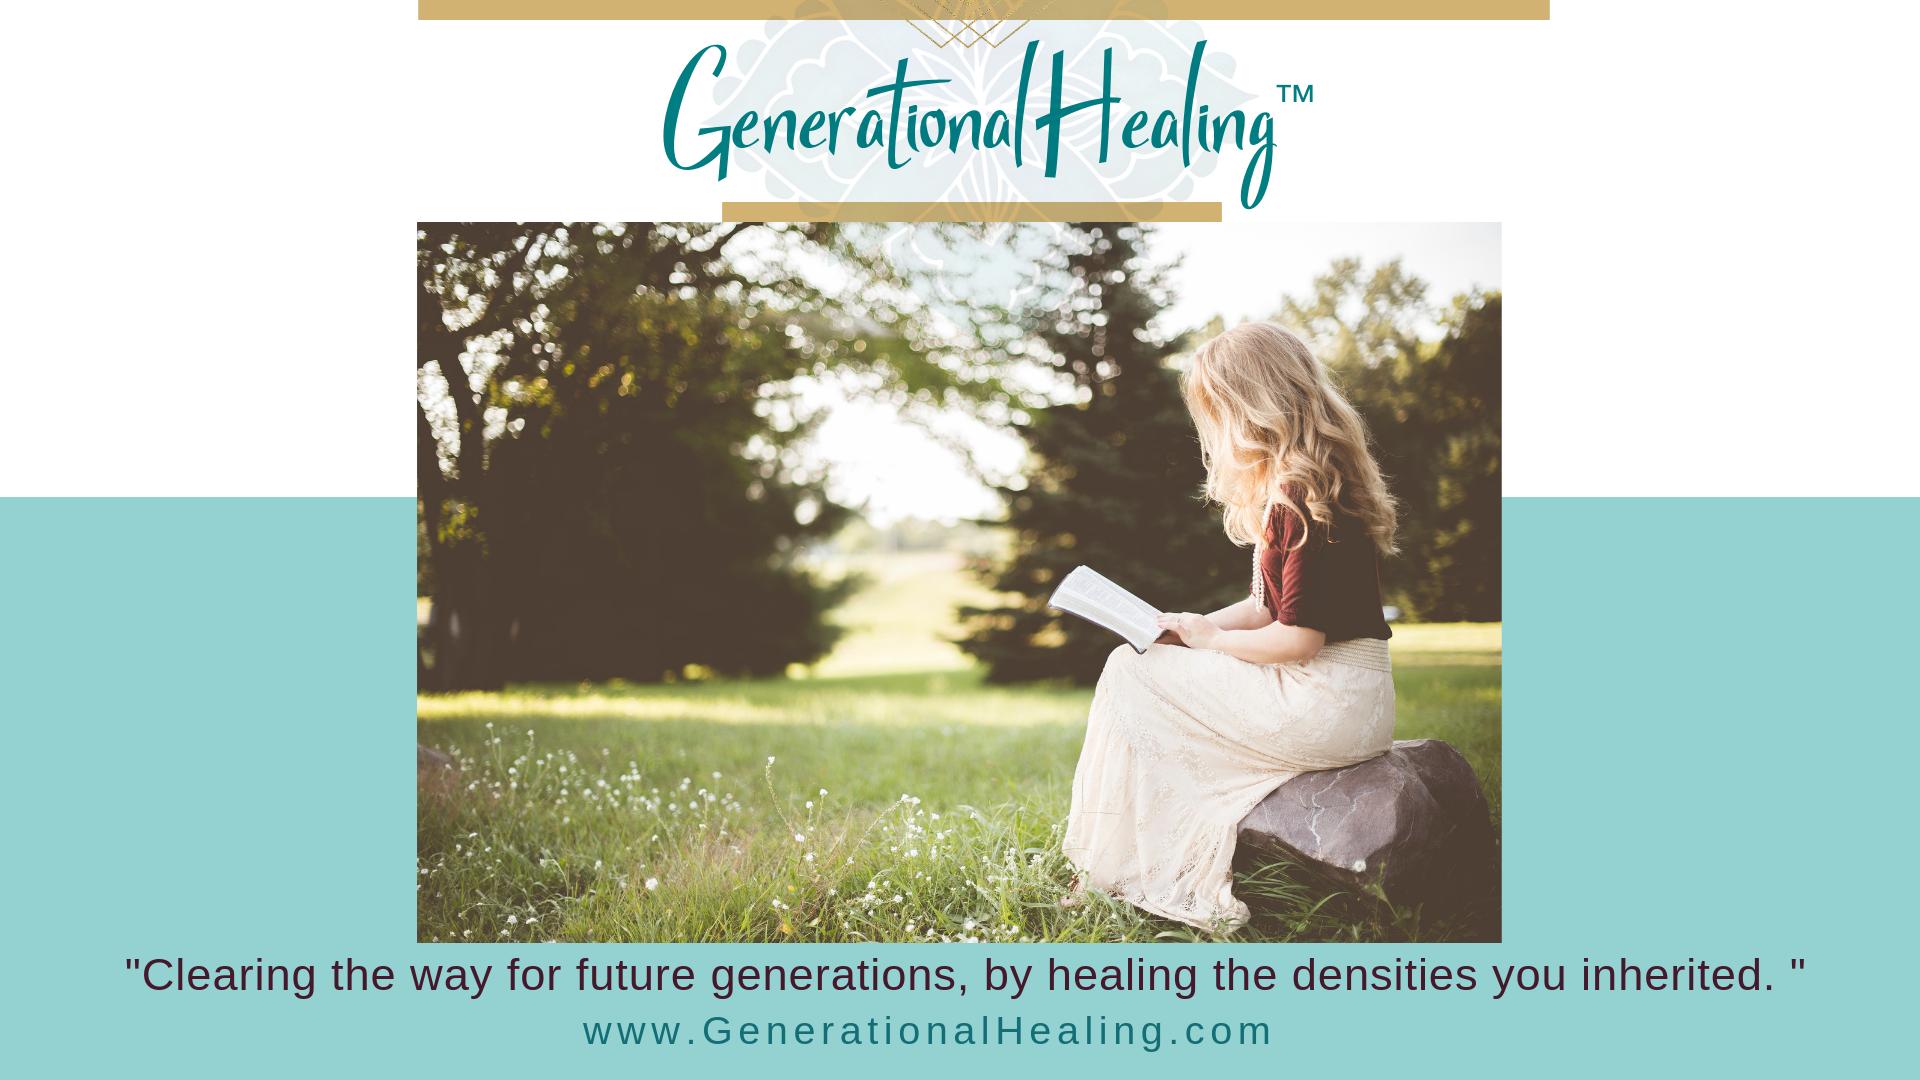 sarah christine generational healing™